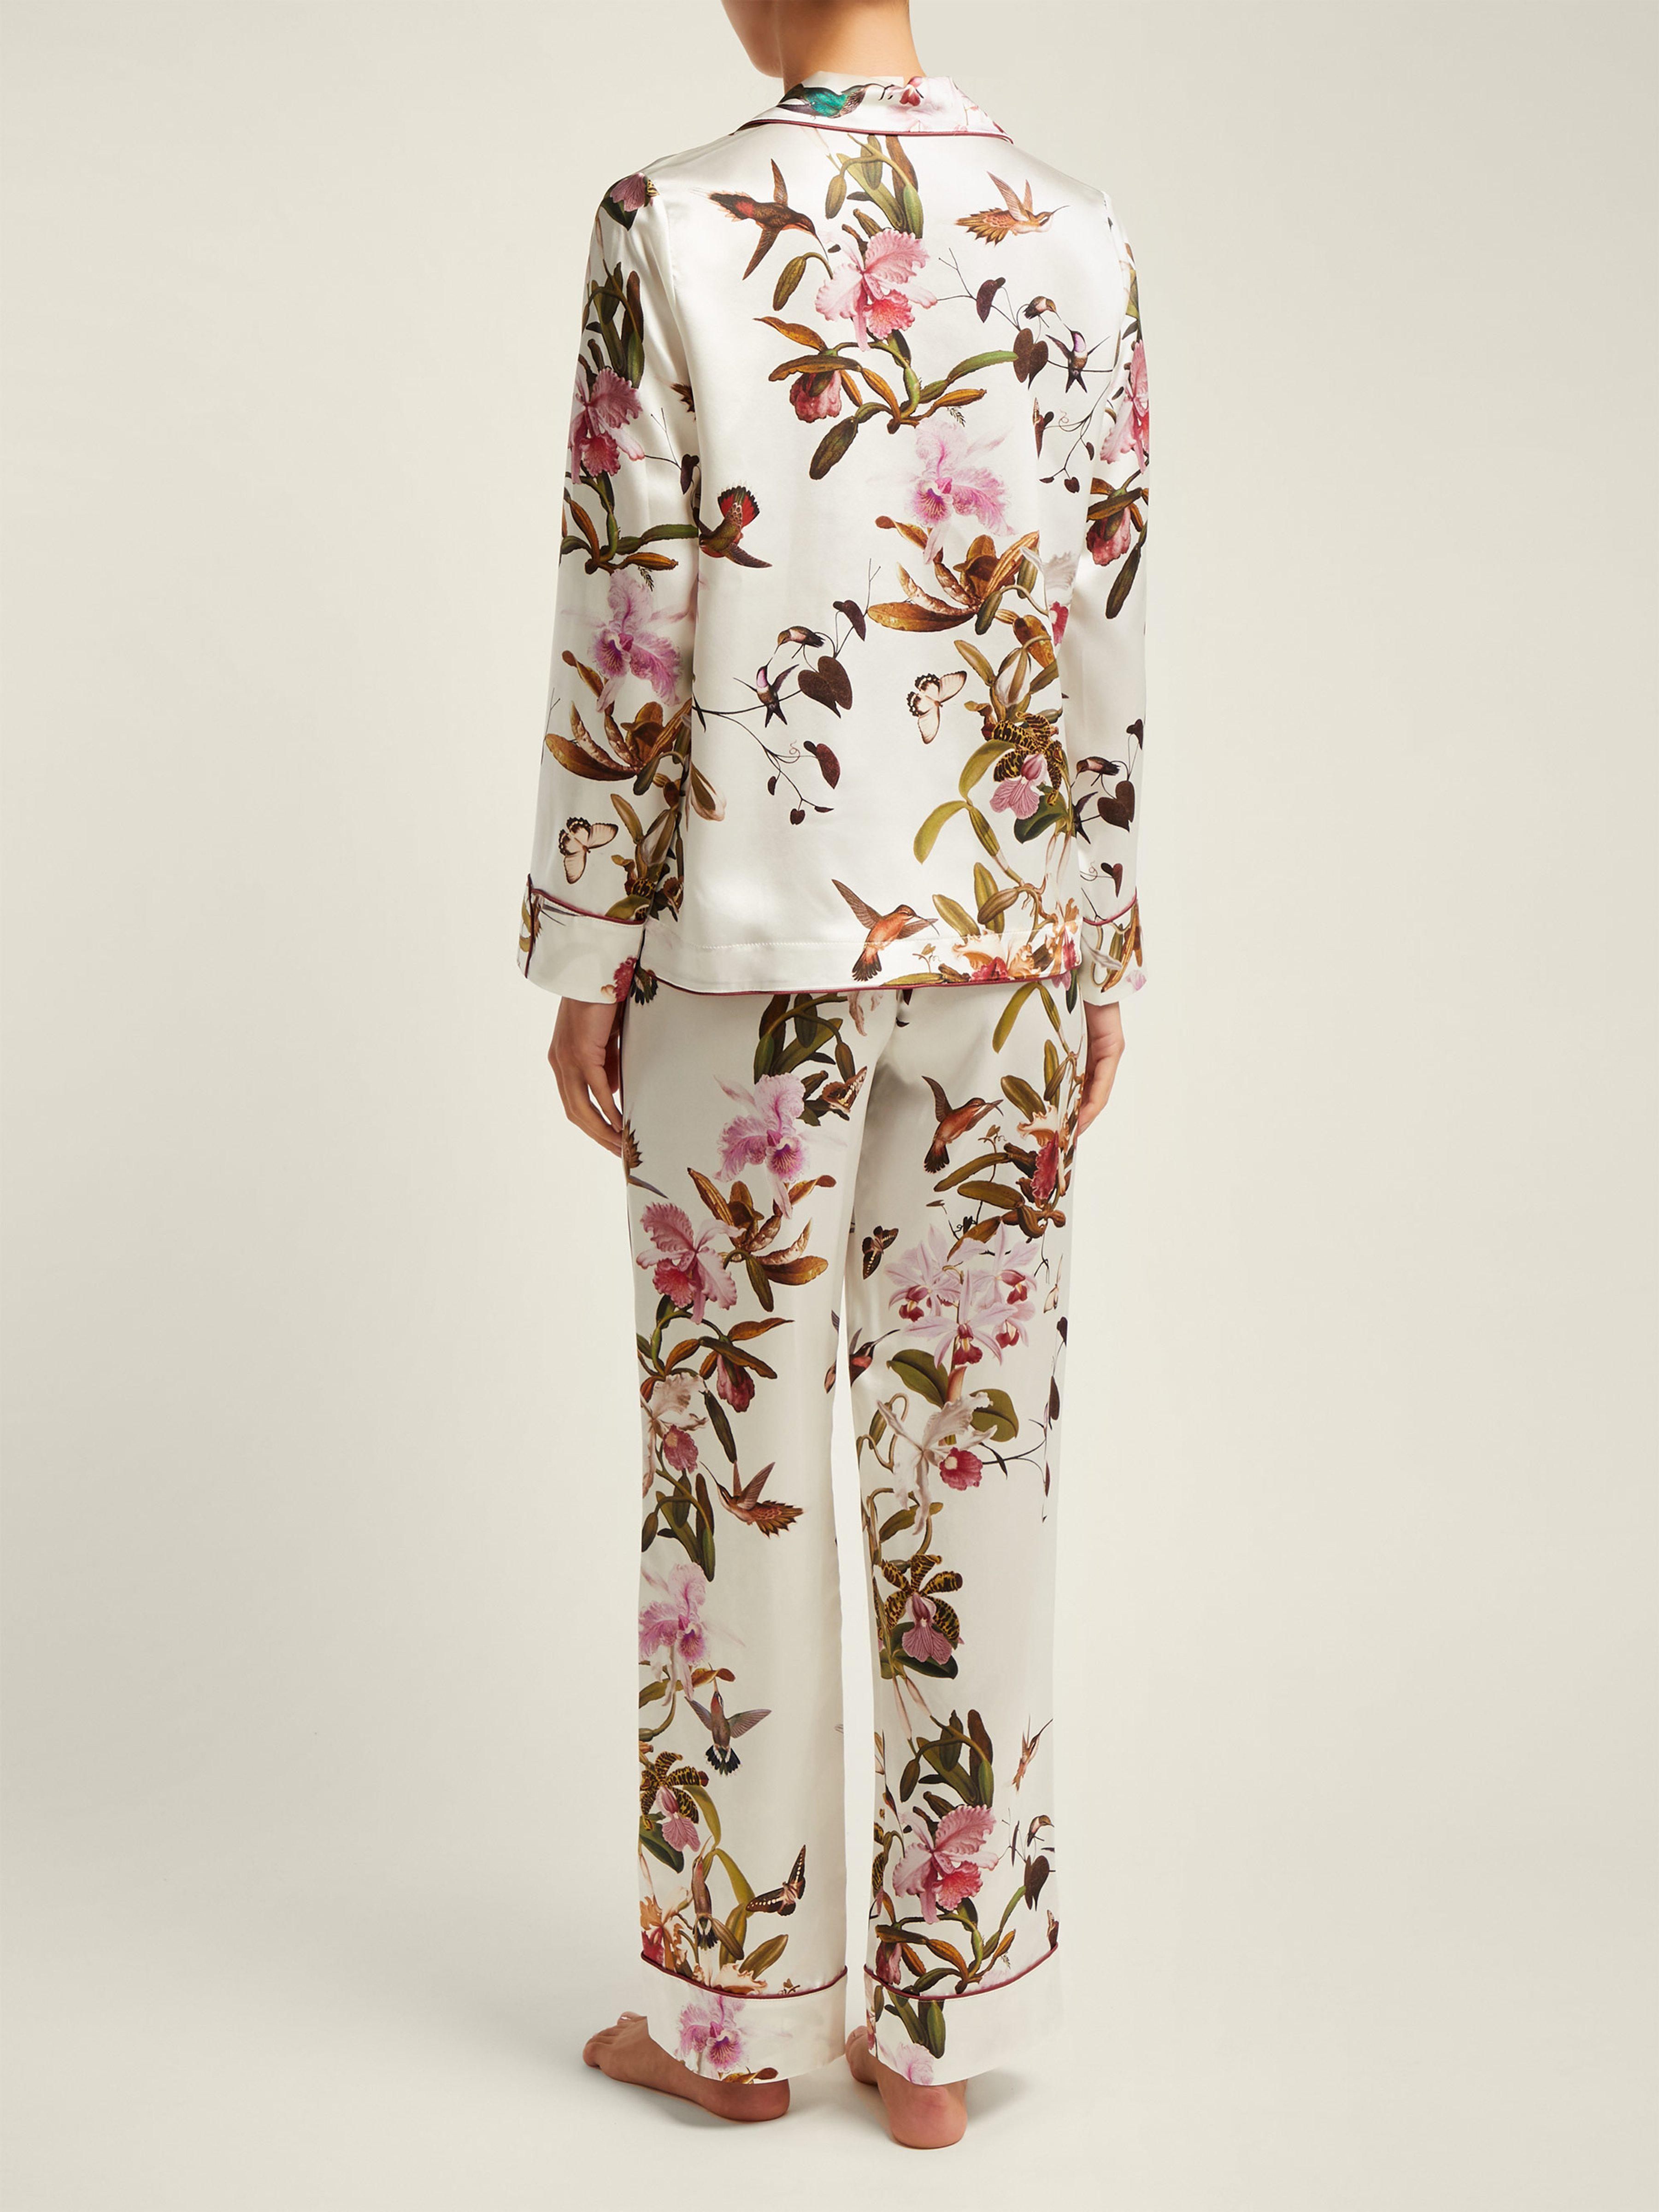 a0e4d07be4 Morpho + Luna - White Colette Floral Print Silk Pyjamas - Lyst. View  fullscreen